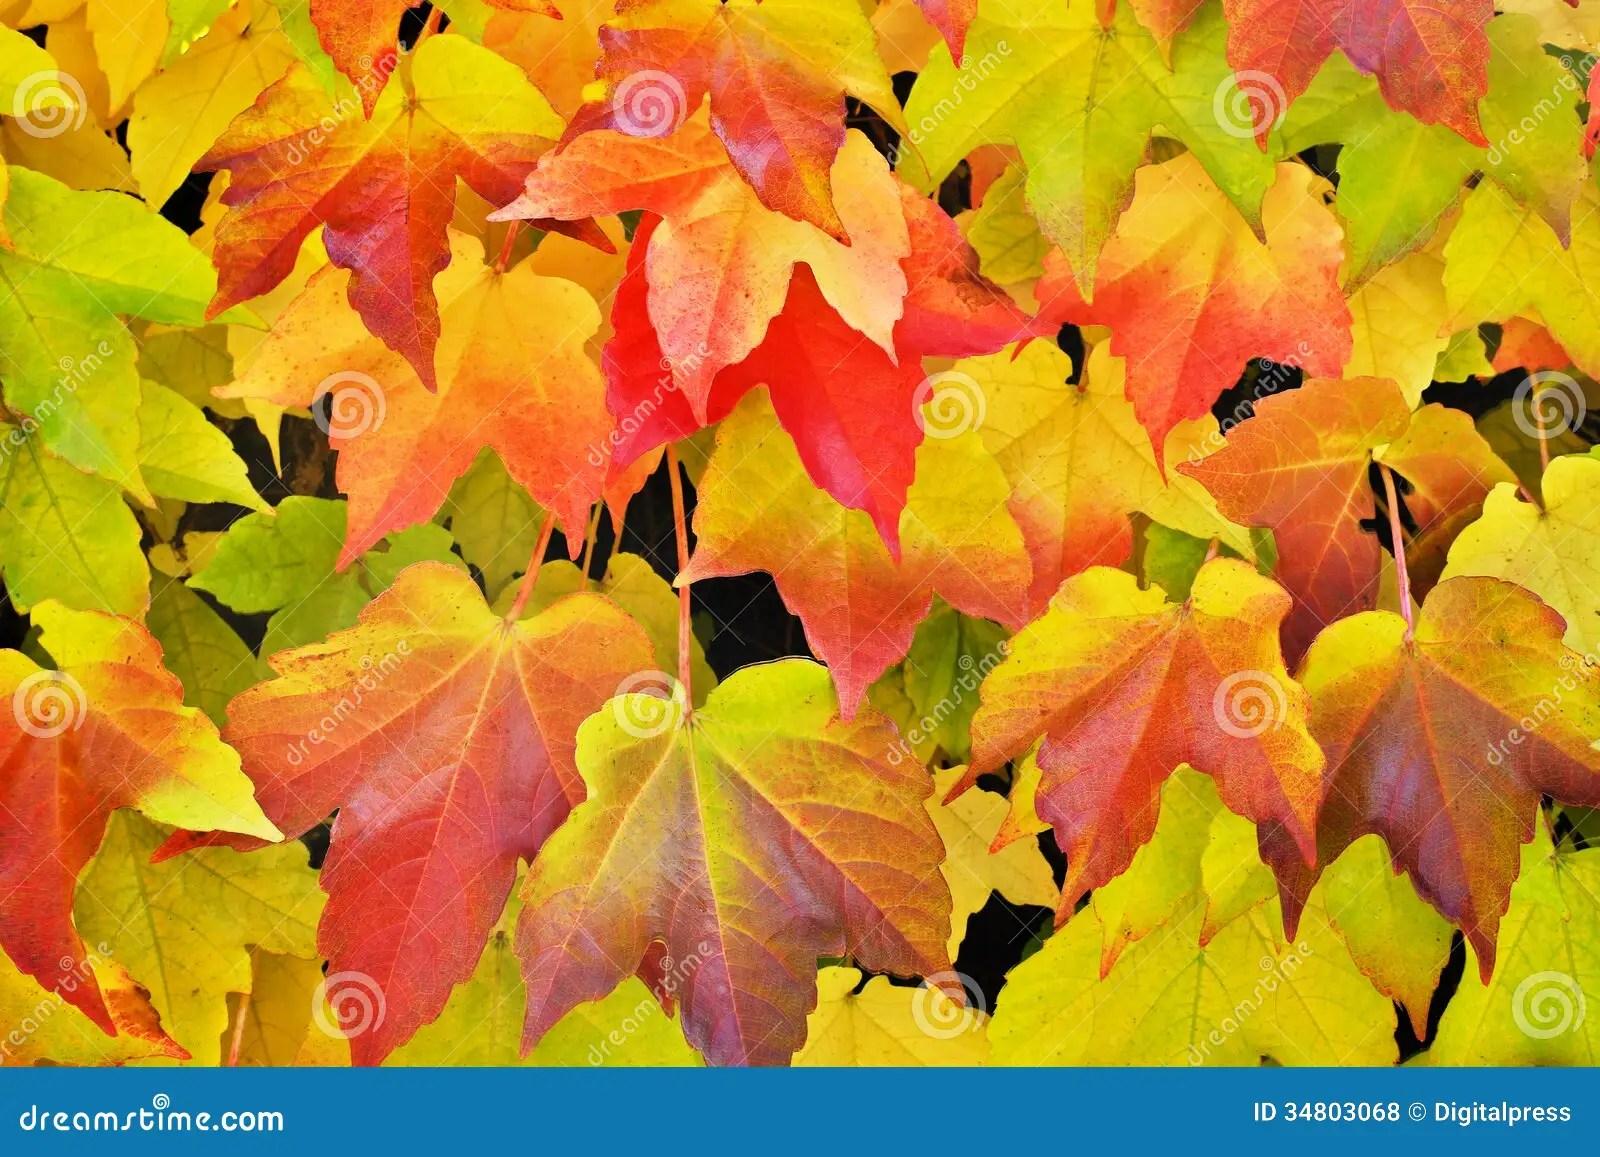 Free Fall Colors Wallpaper Virginia Creeper In Autumn Colors Stock Photo Image